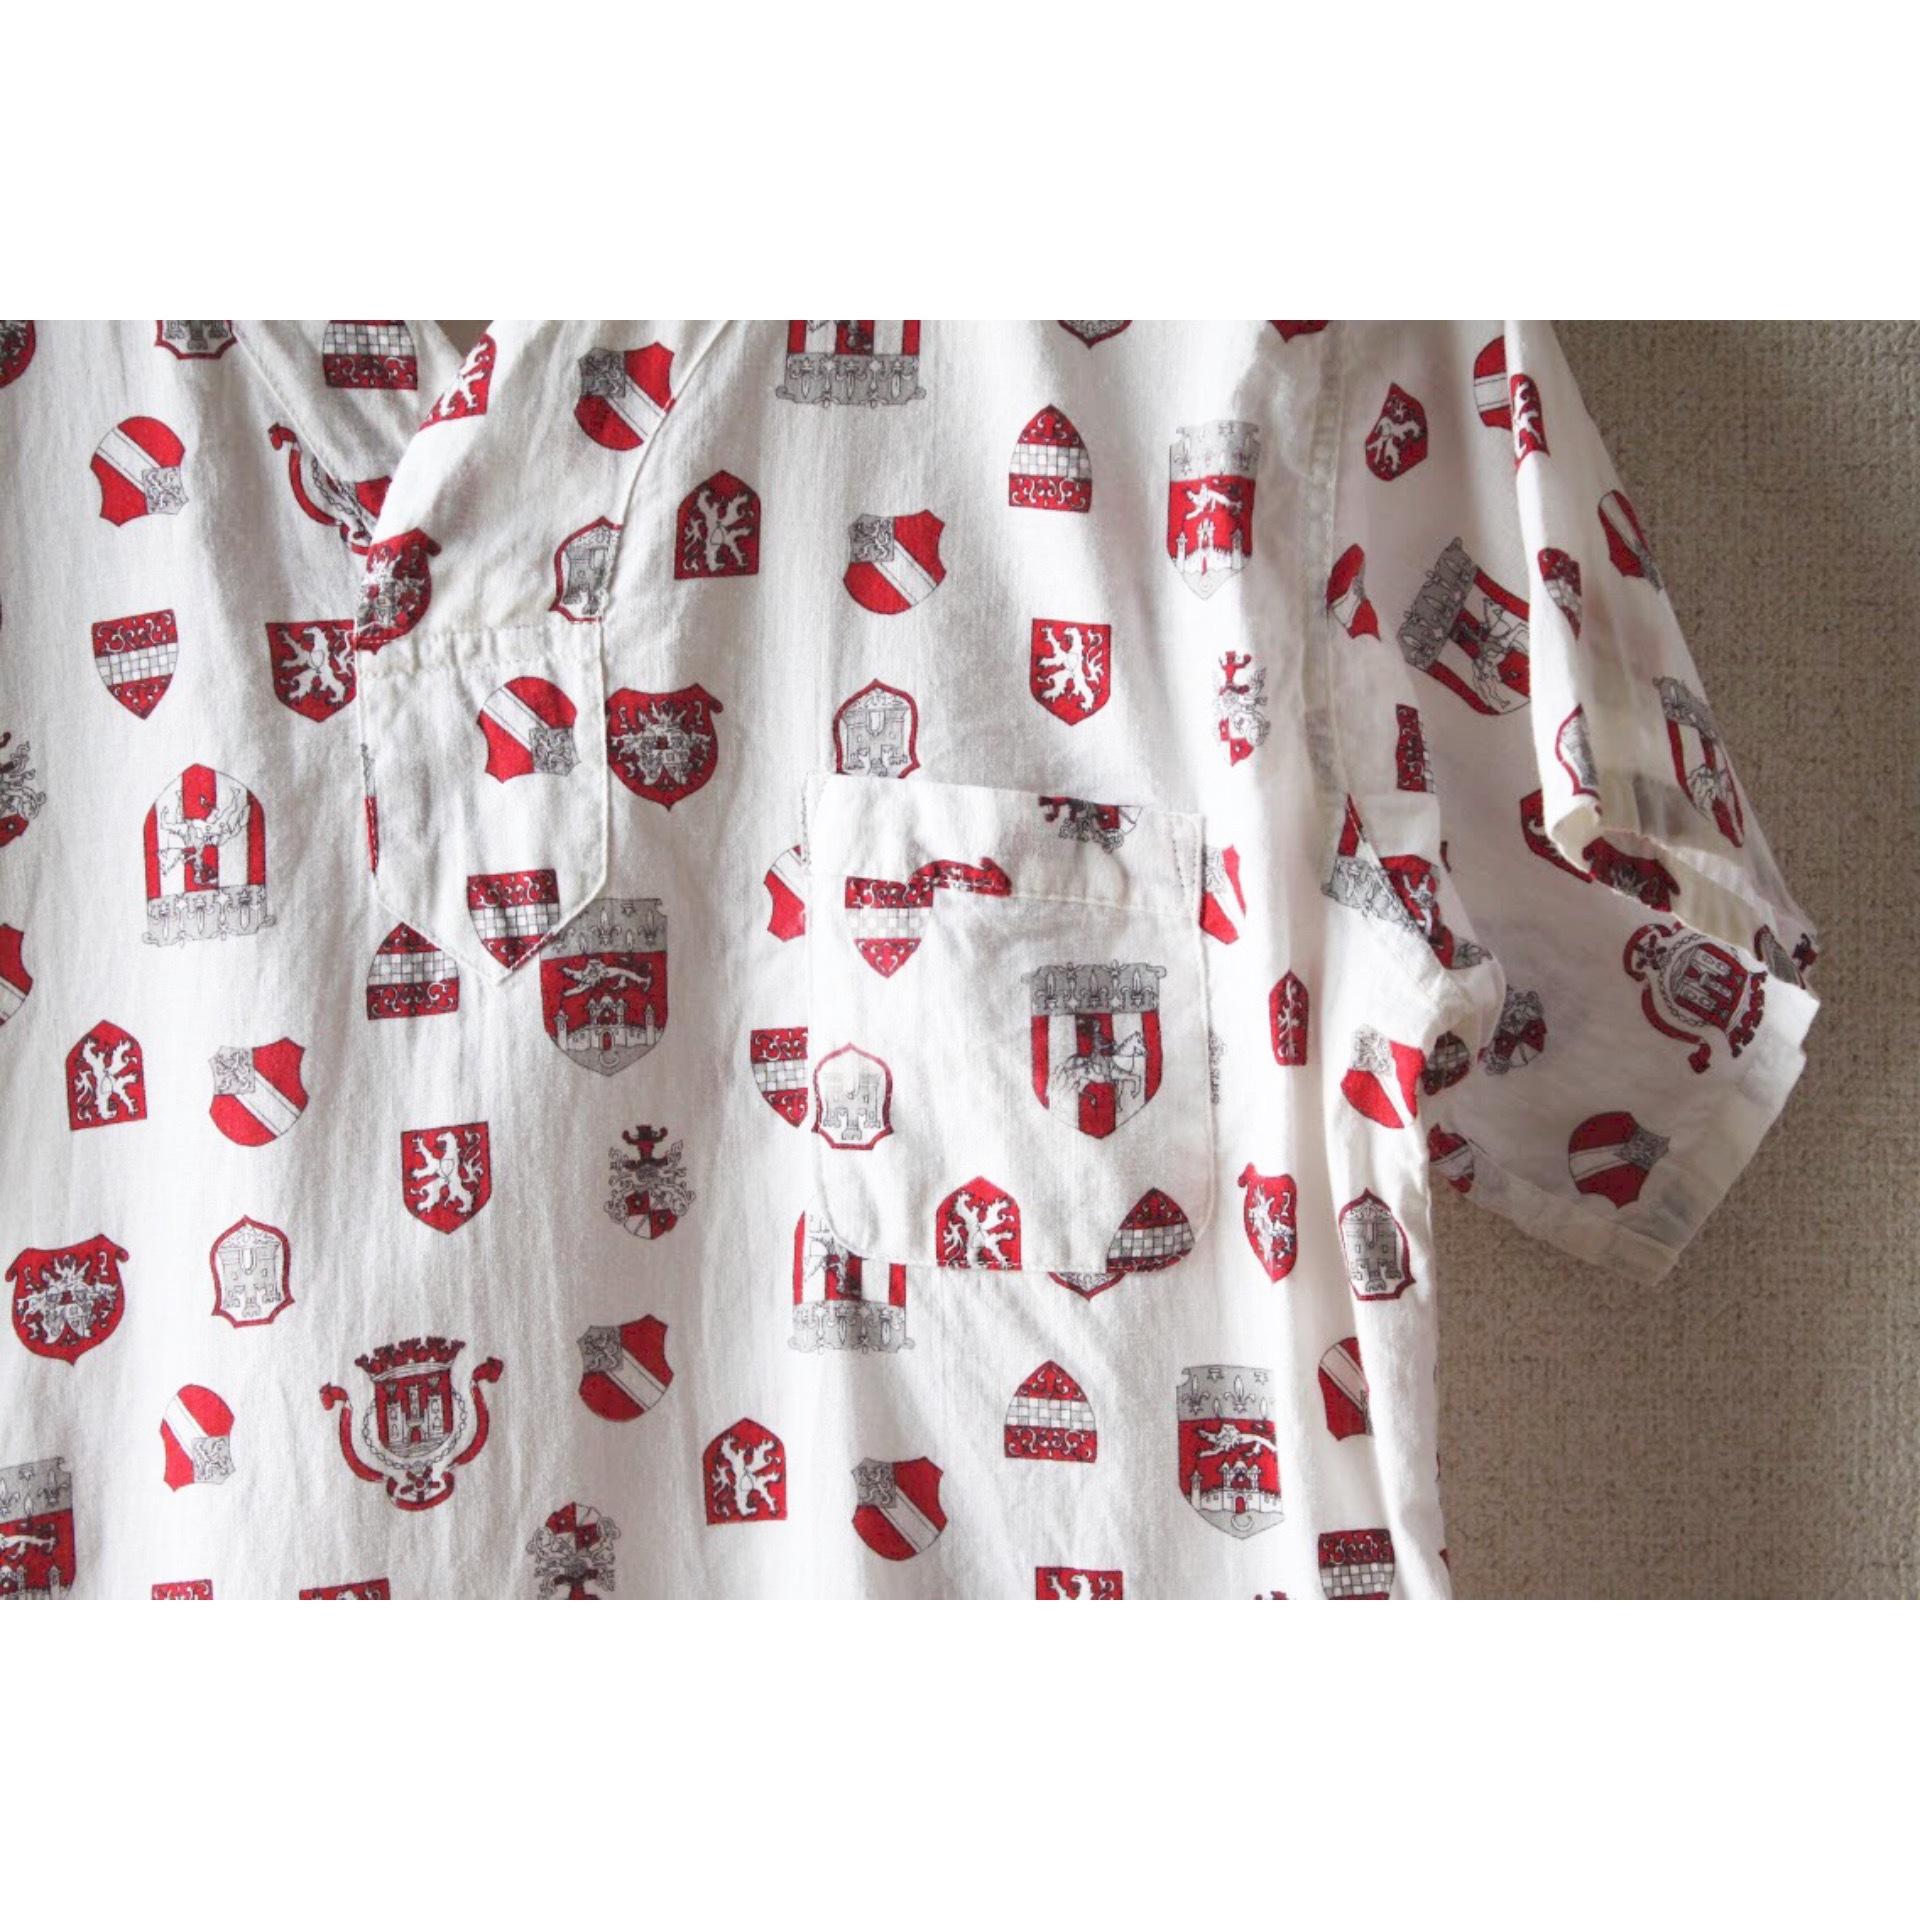 Vintage pullover pajama shirt